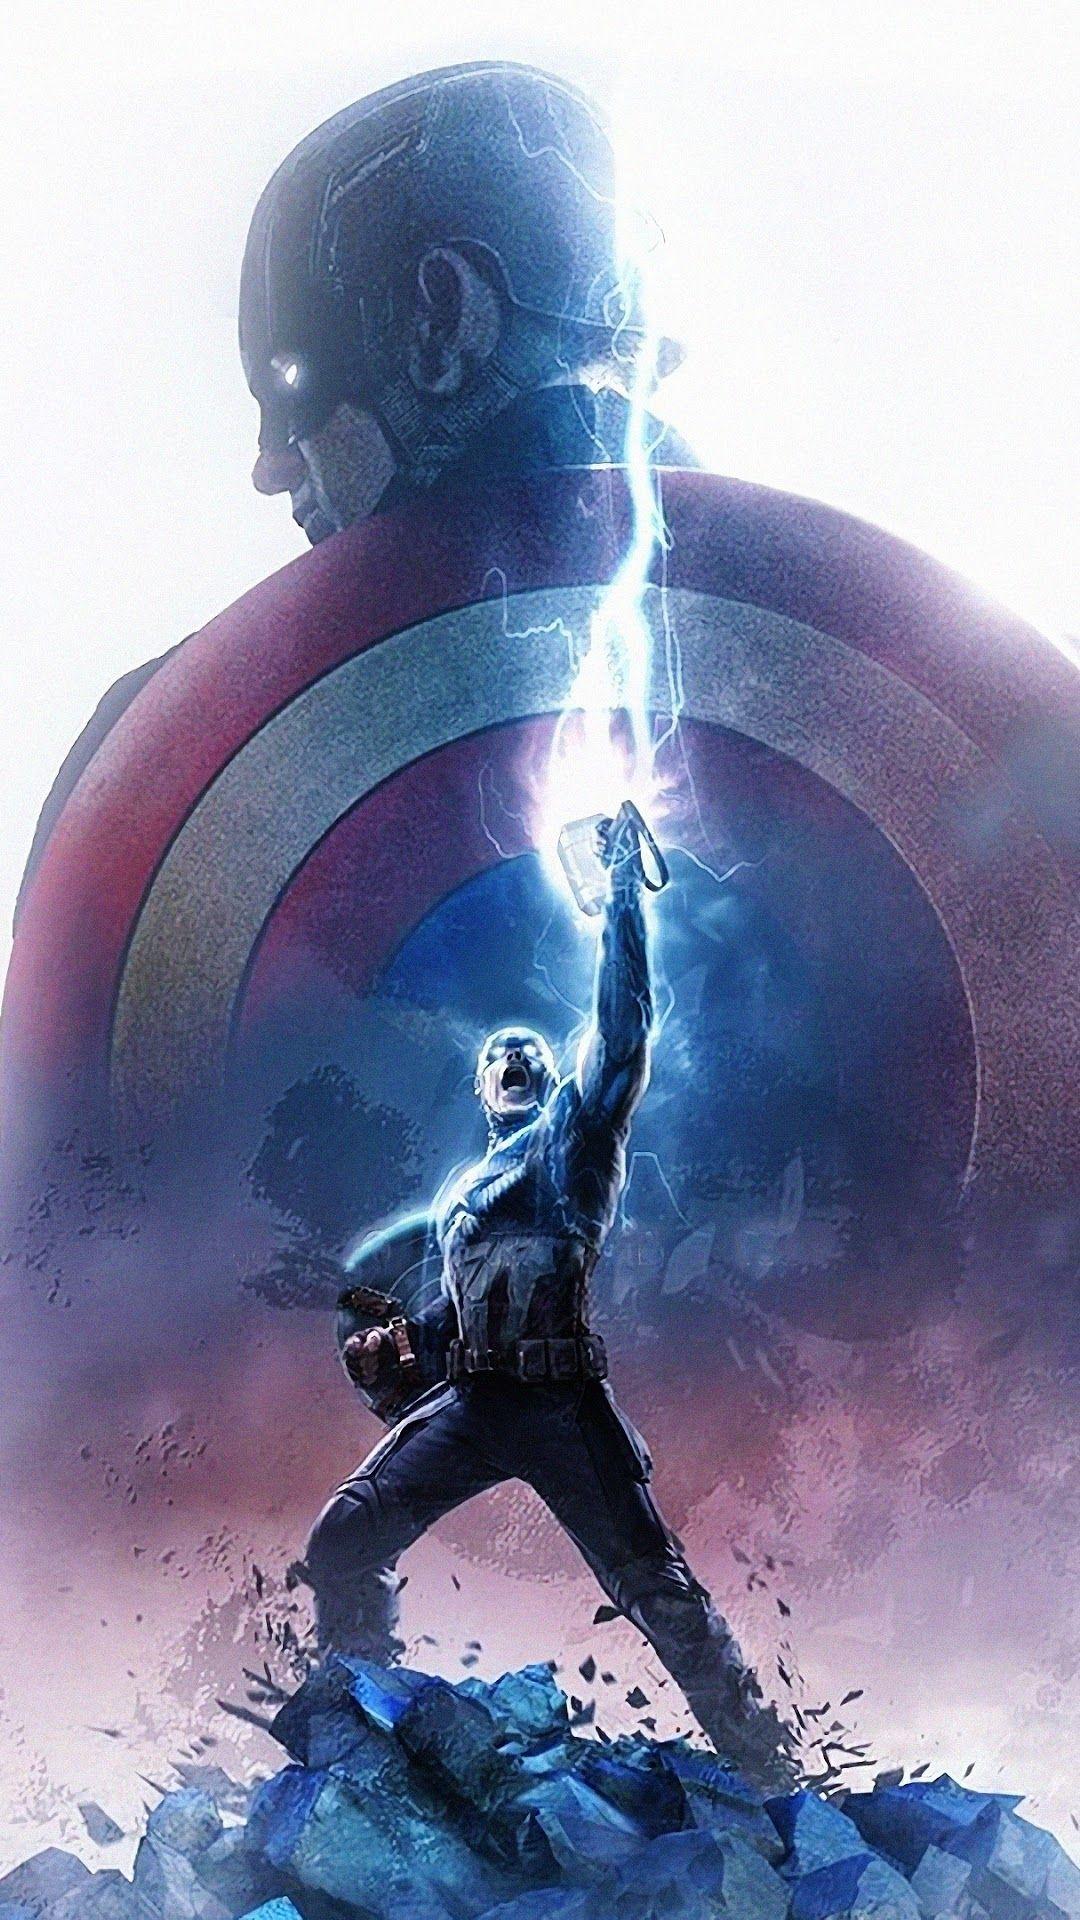 Captain America Hd Wallpaper Android ~ Cinematics ...